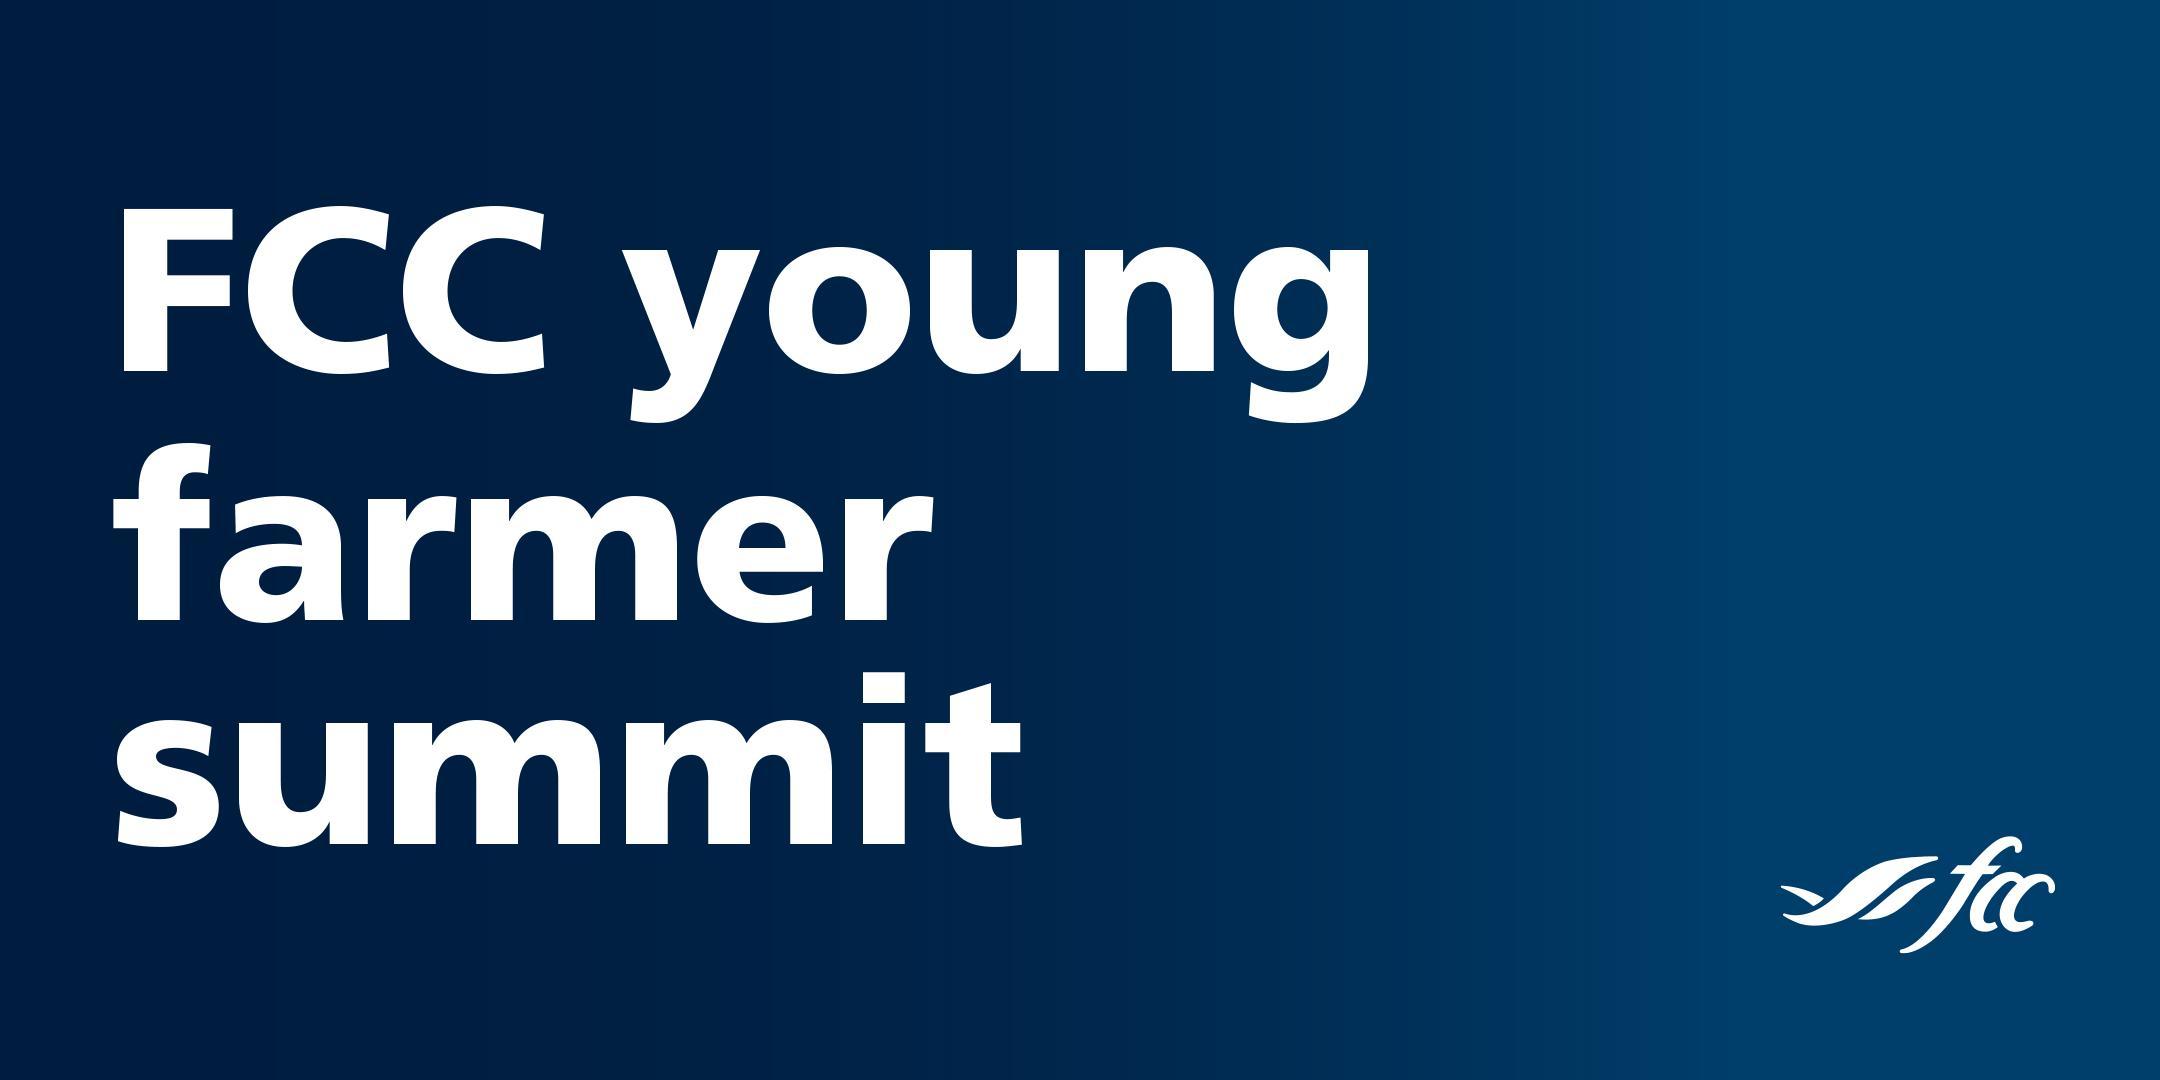 FCC Young Farmer Summit - Ignite - Winnipeg